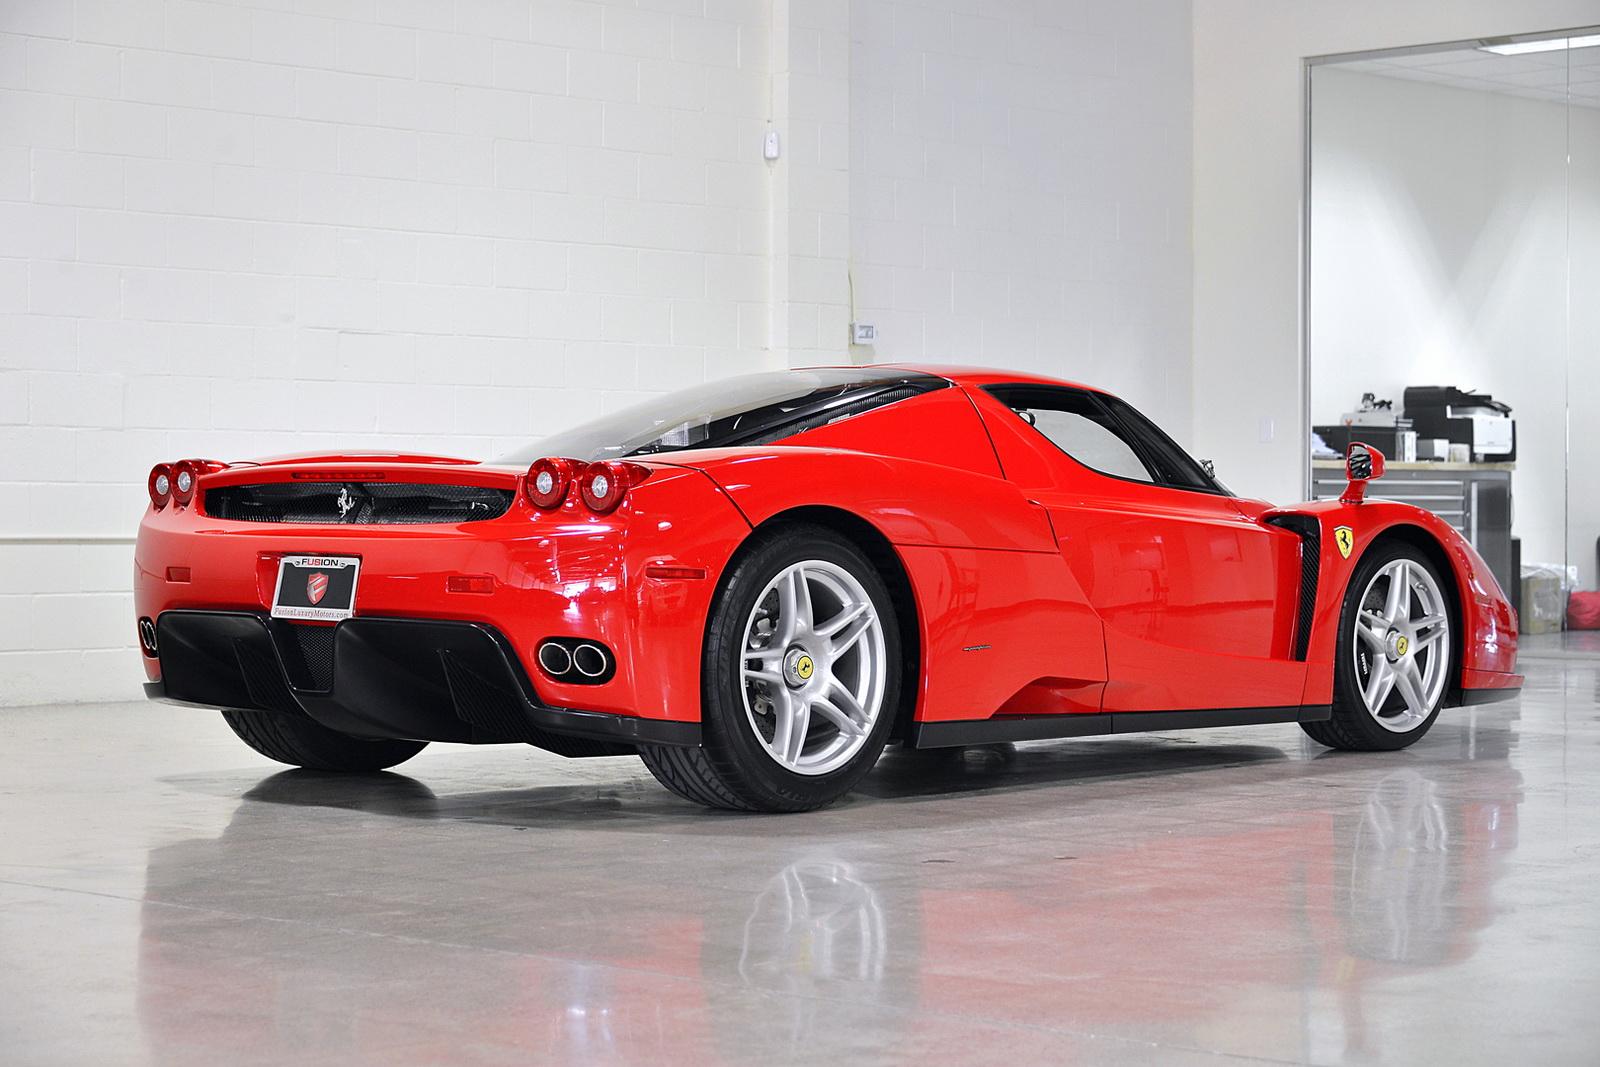 Ferrari F80 Price >> My Precious: Ferrari Enzo With Just 354 Miles For Sale - carscoops.com